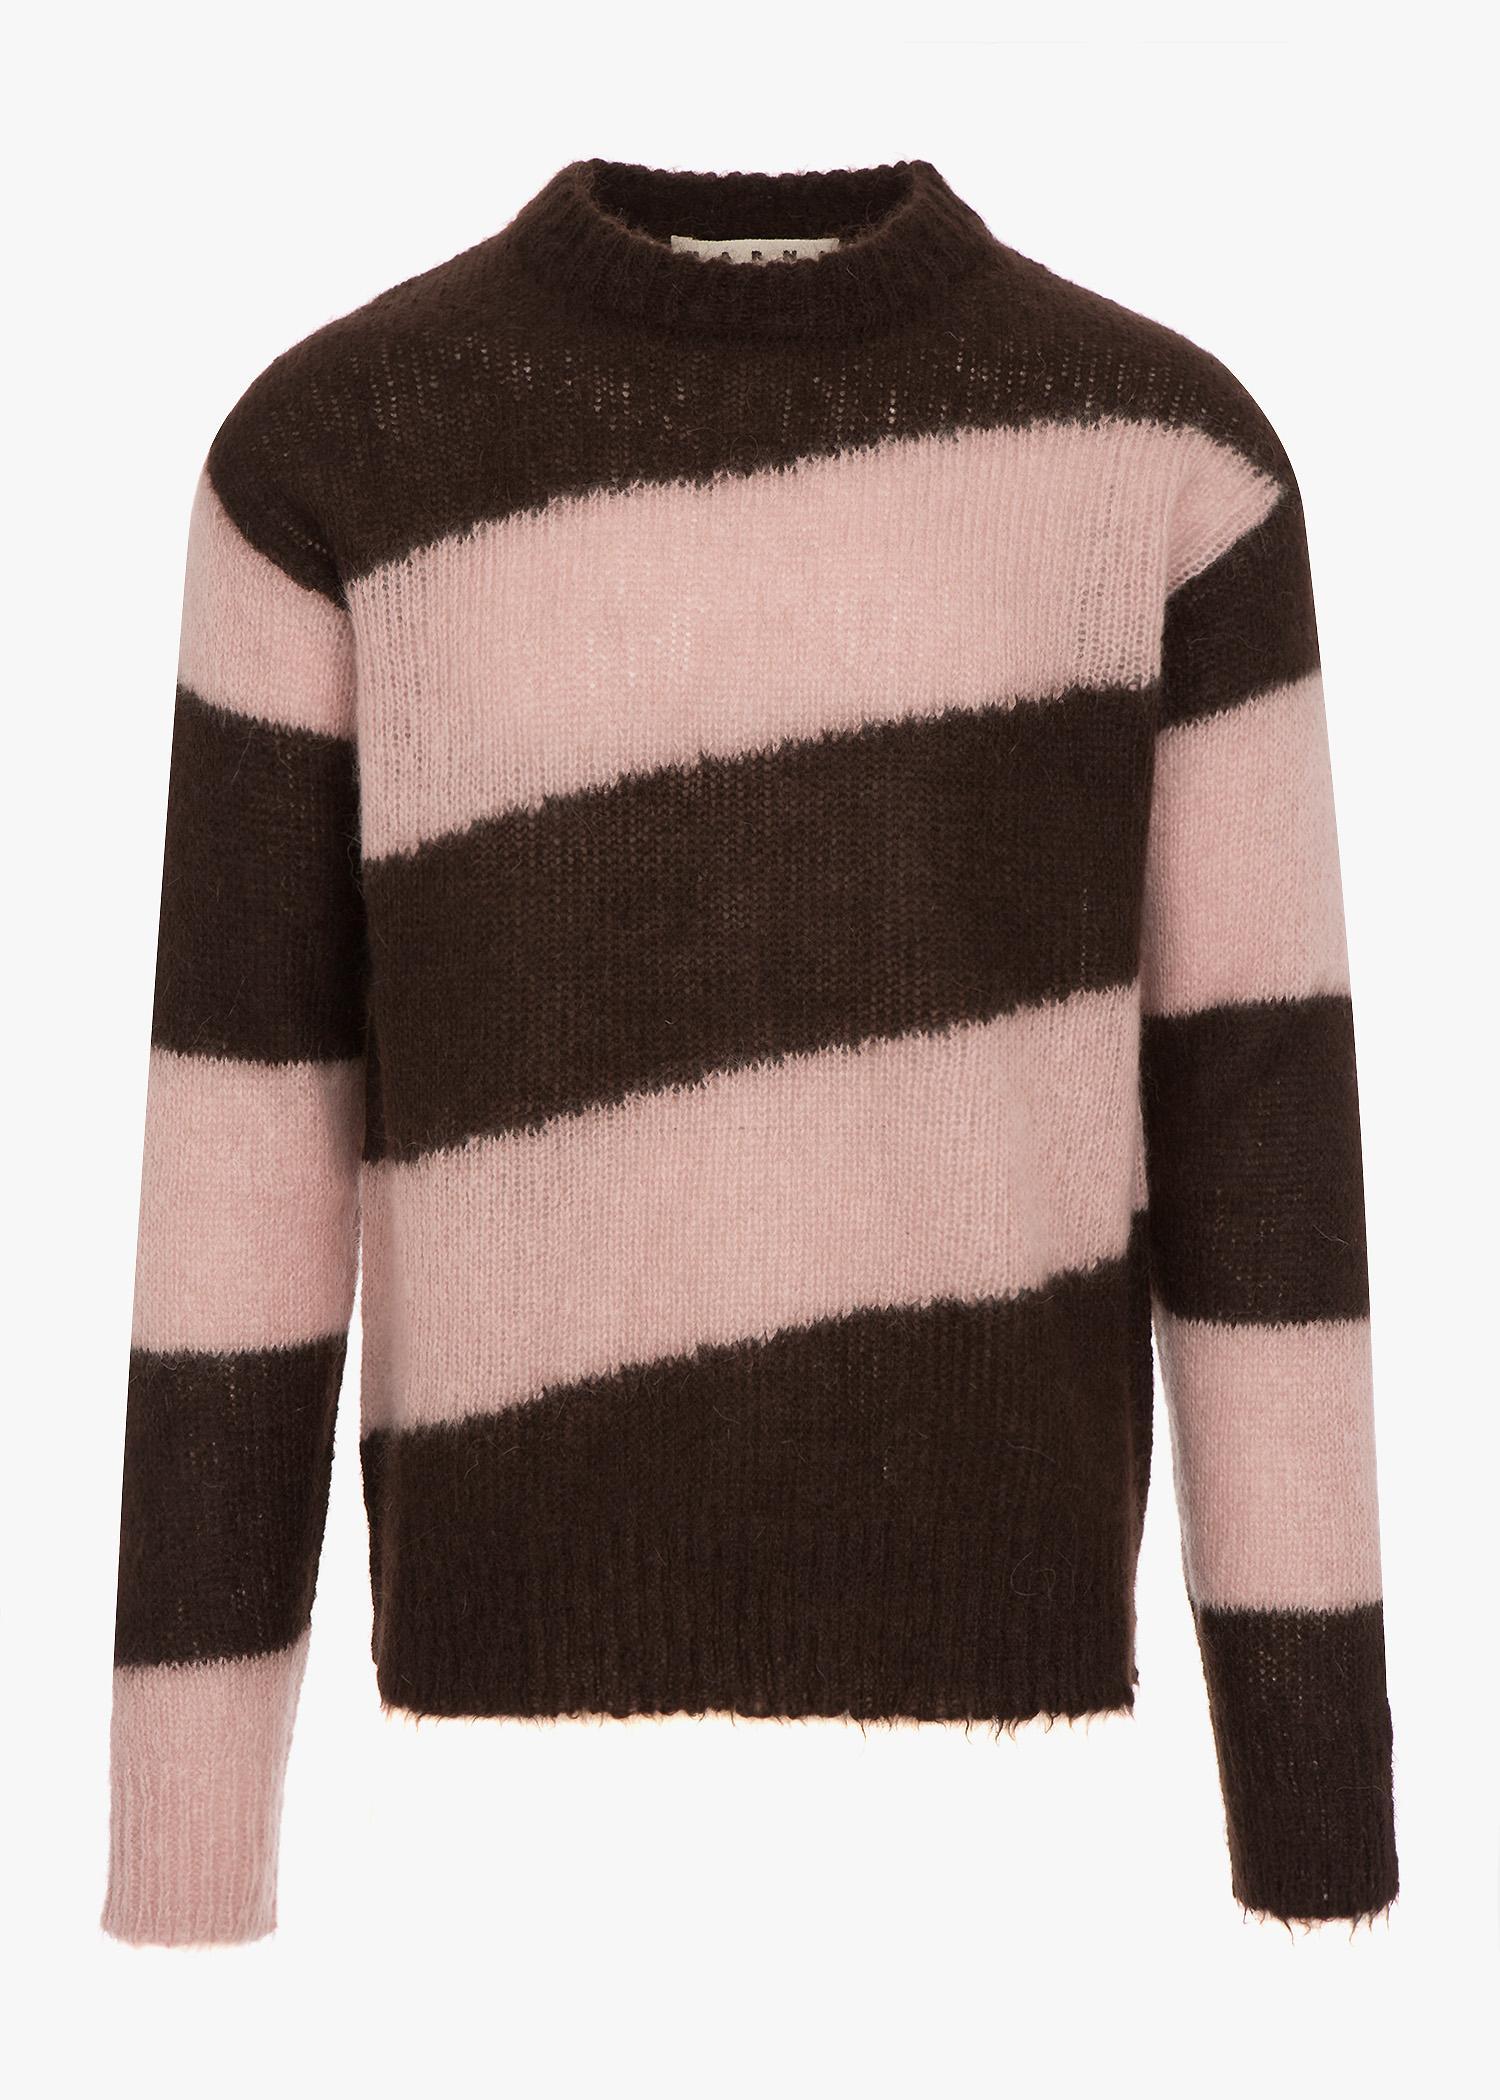 a516f30530e6ae Marni Big Striped Knit Sweater In Brown/Pink   ModeSens